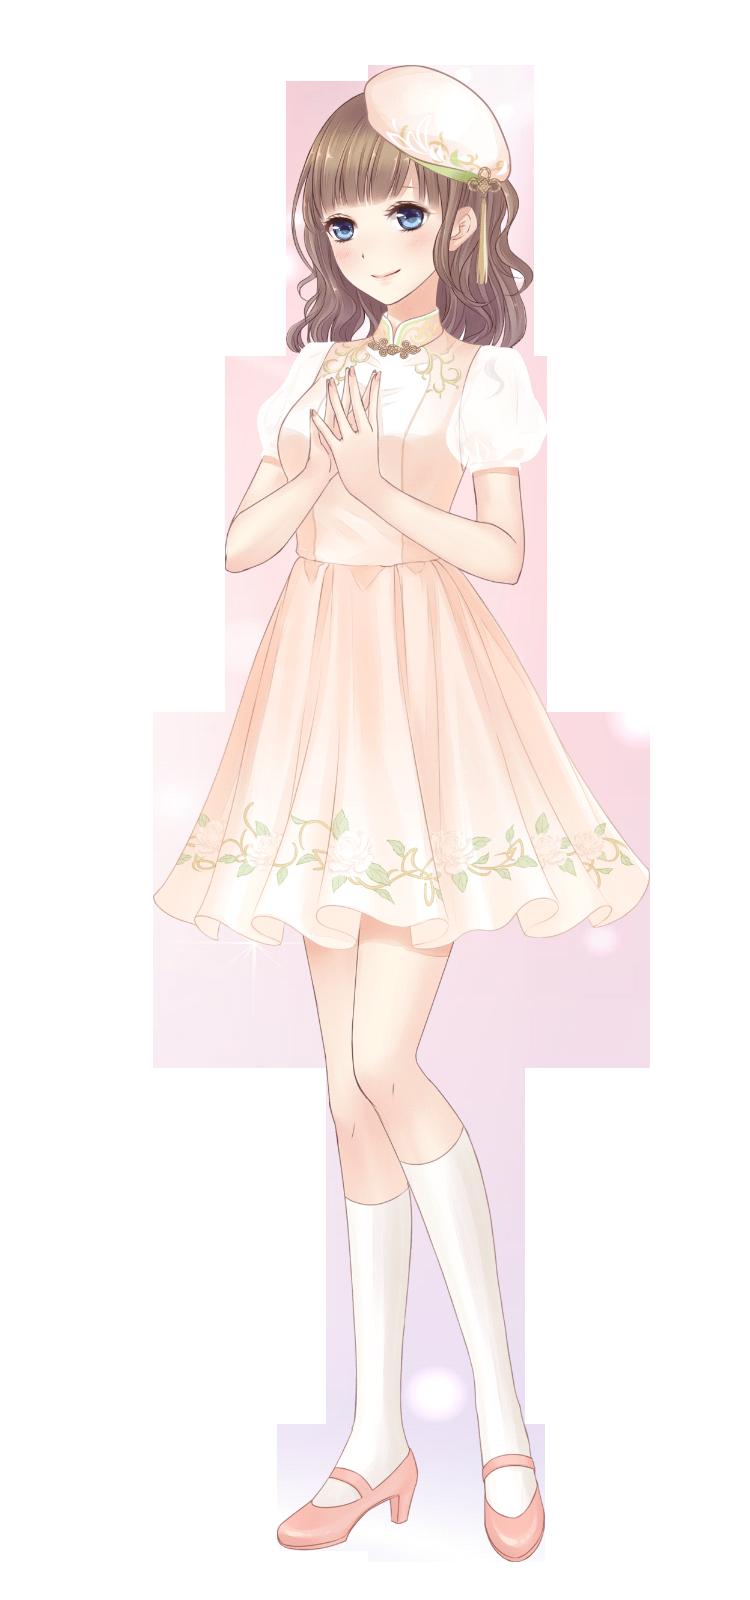 Chapter 7 u82cfu82cf | u3010u56feu9274u3011u5947u8ff9u6696u6696 u00b7 u30dfu30e9u30afu30ebu30cbu30ad u00b7 Miracle Nikki | Pinterest | Anime Anime outfits and Characters